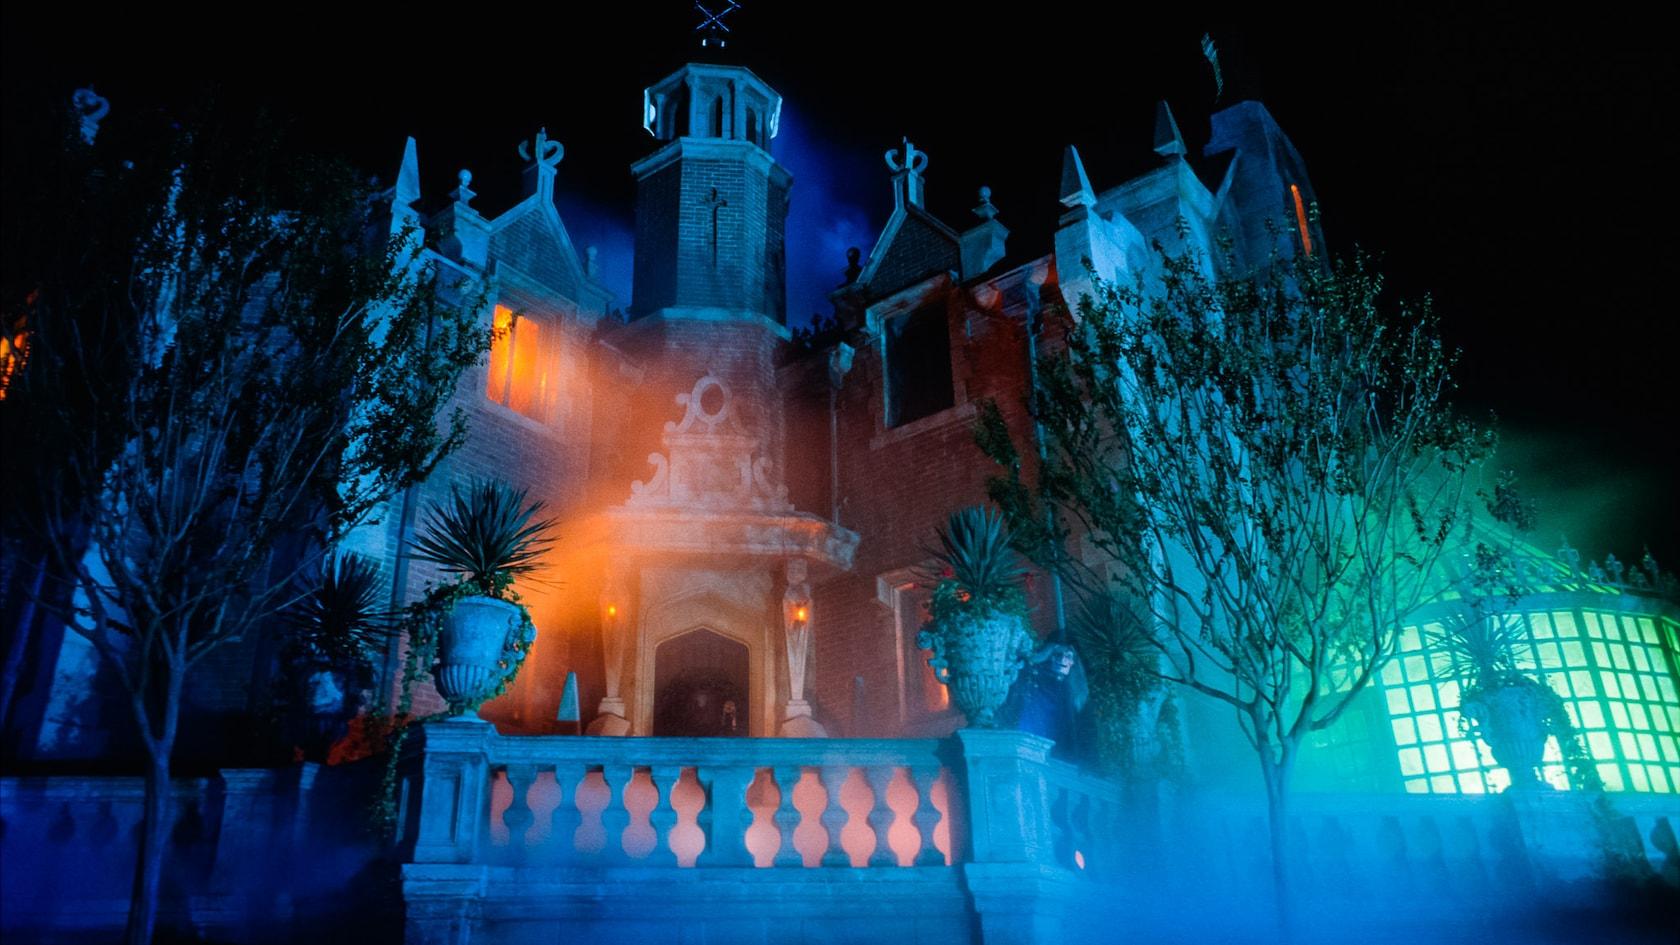 The Haunted Mansion | Magic Kingdom Attractions | Walt Disney World Resort